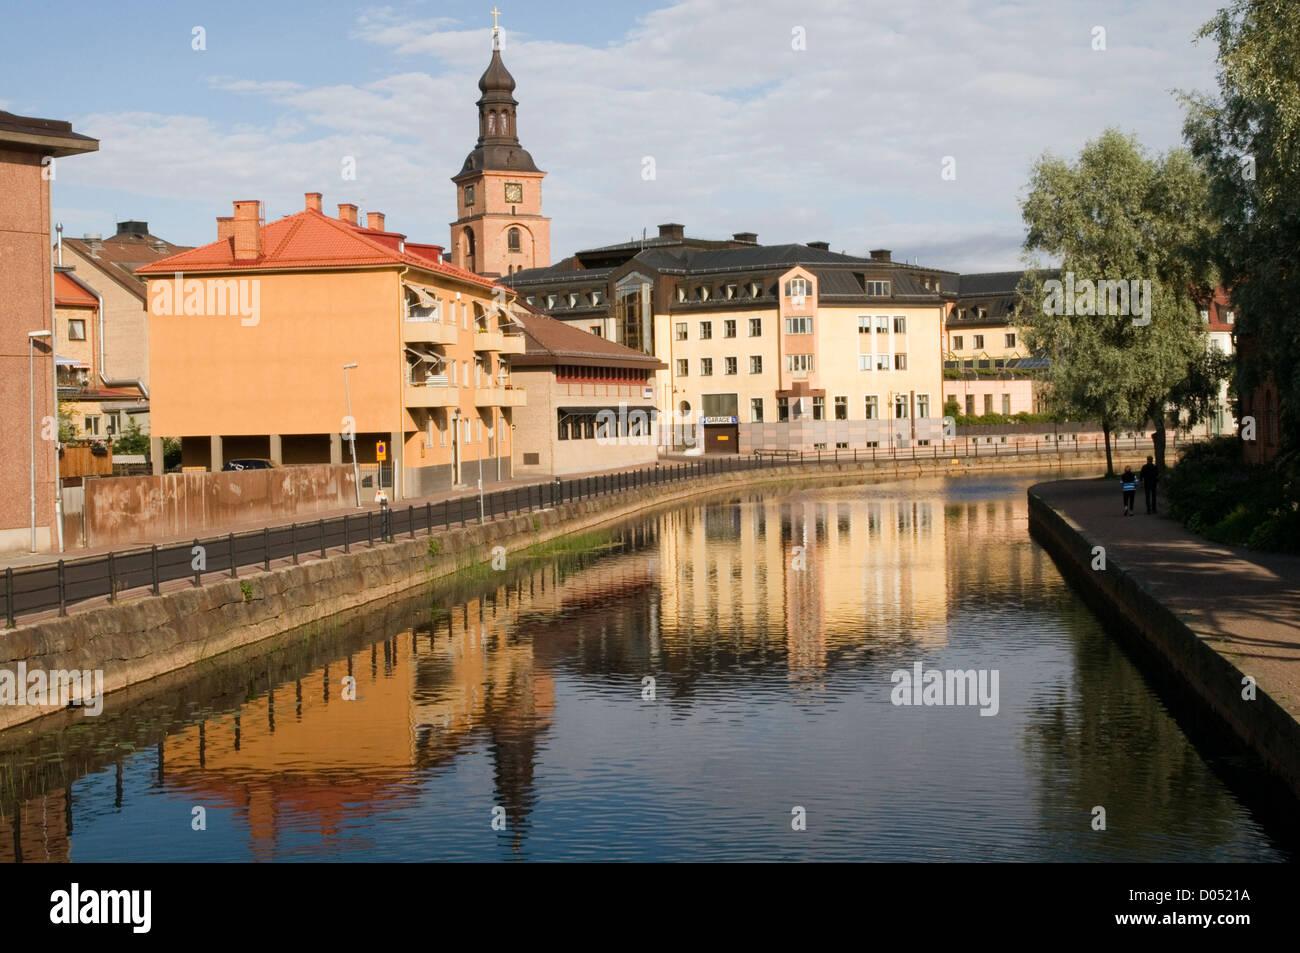 falun gemeinde in dalarna grafschaft schweden schwedische stadt stockfoto bild 51742470 alamy. Black Bedroom Furniture Sets. Home Design Ideas